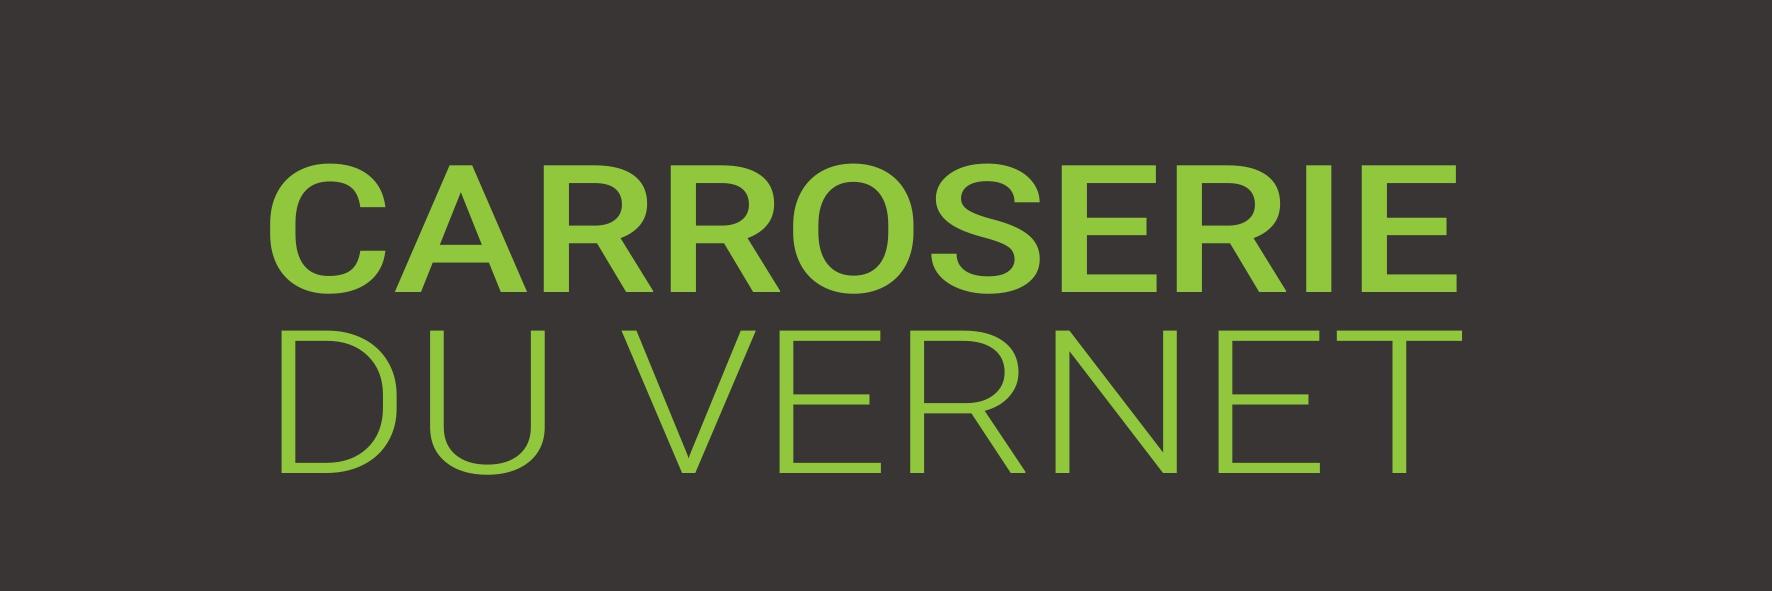 http://usepmm.fr/wp-content/uploads/2021/03/Carrosserie-du-vernet-Vert_page-0001.jpg